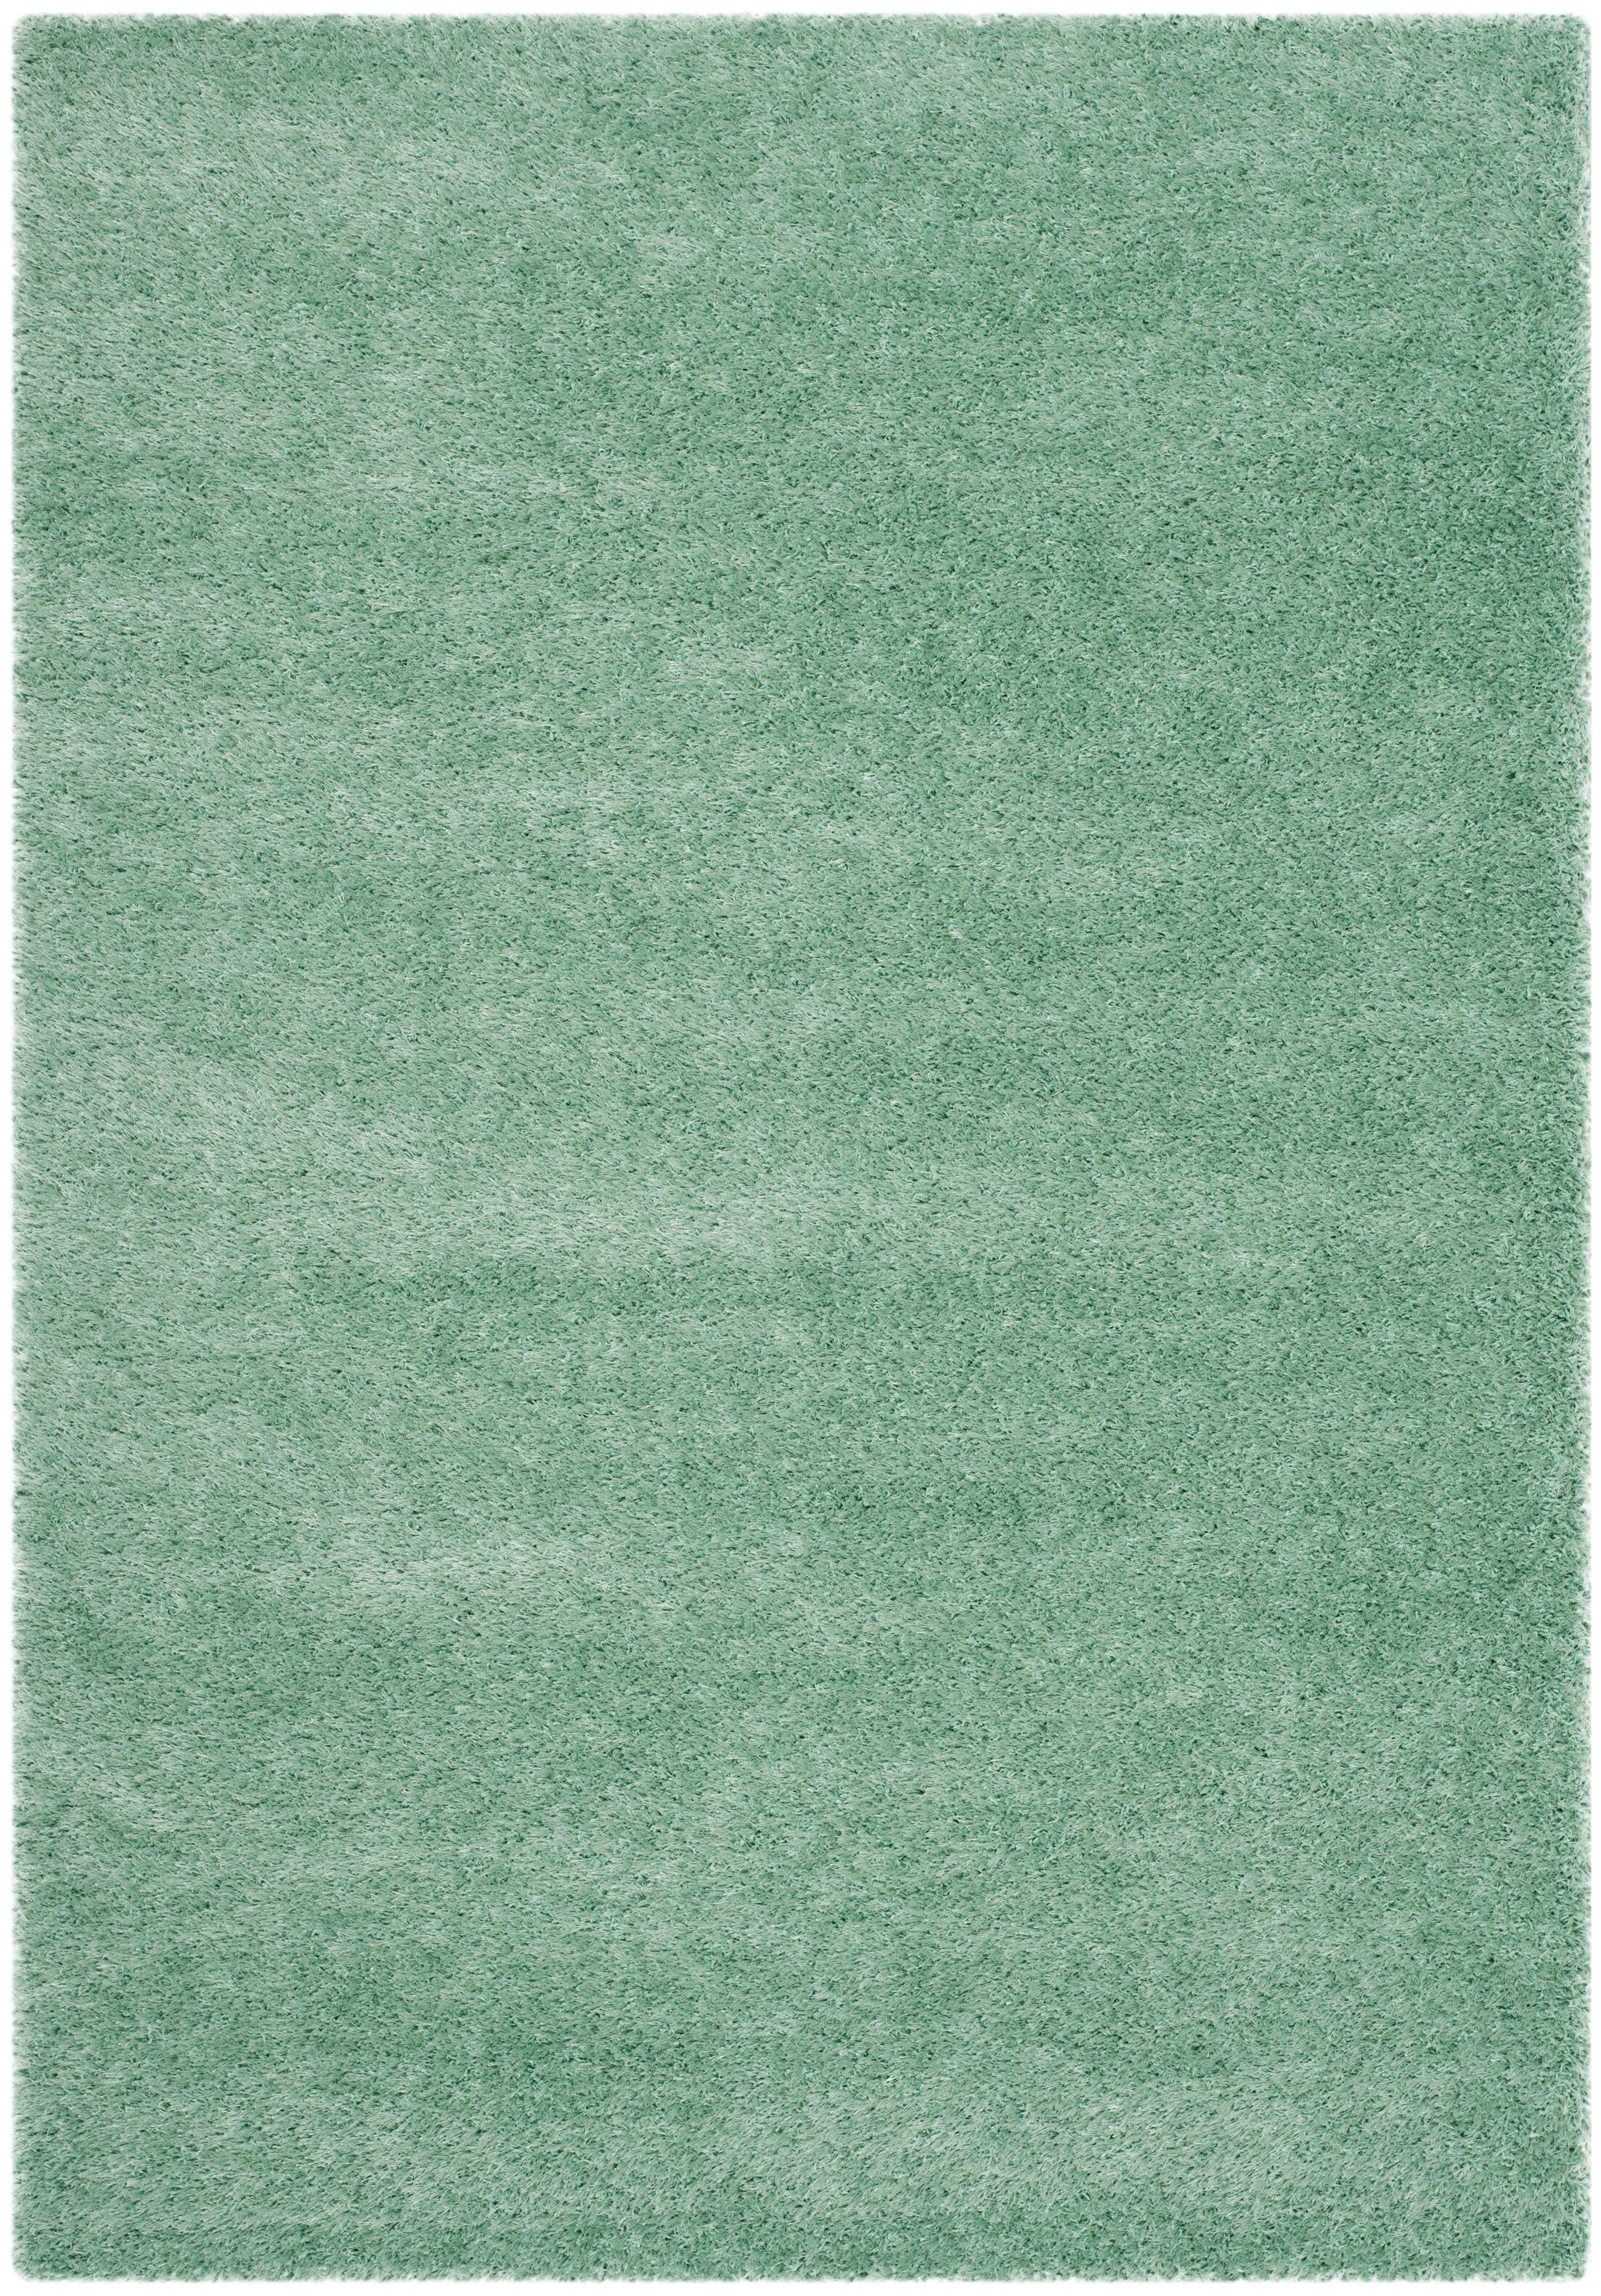 Davey Teal Rug Rug Size: Rectangle 5'1